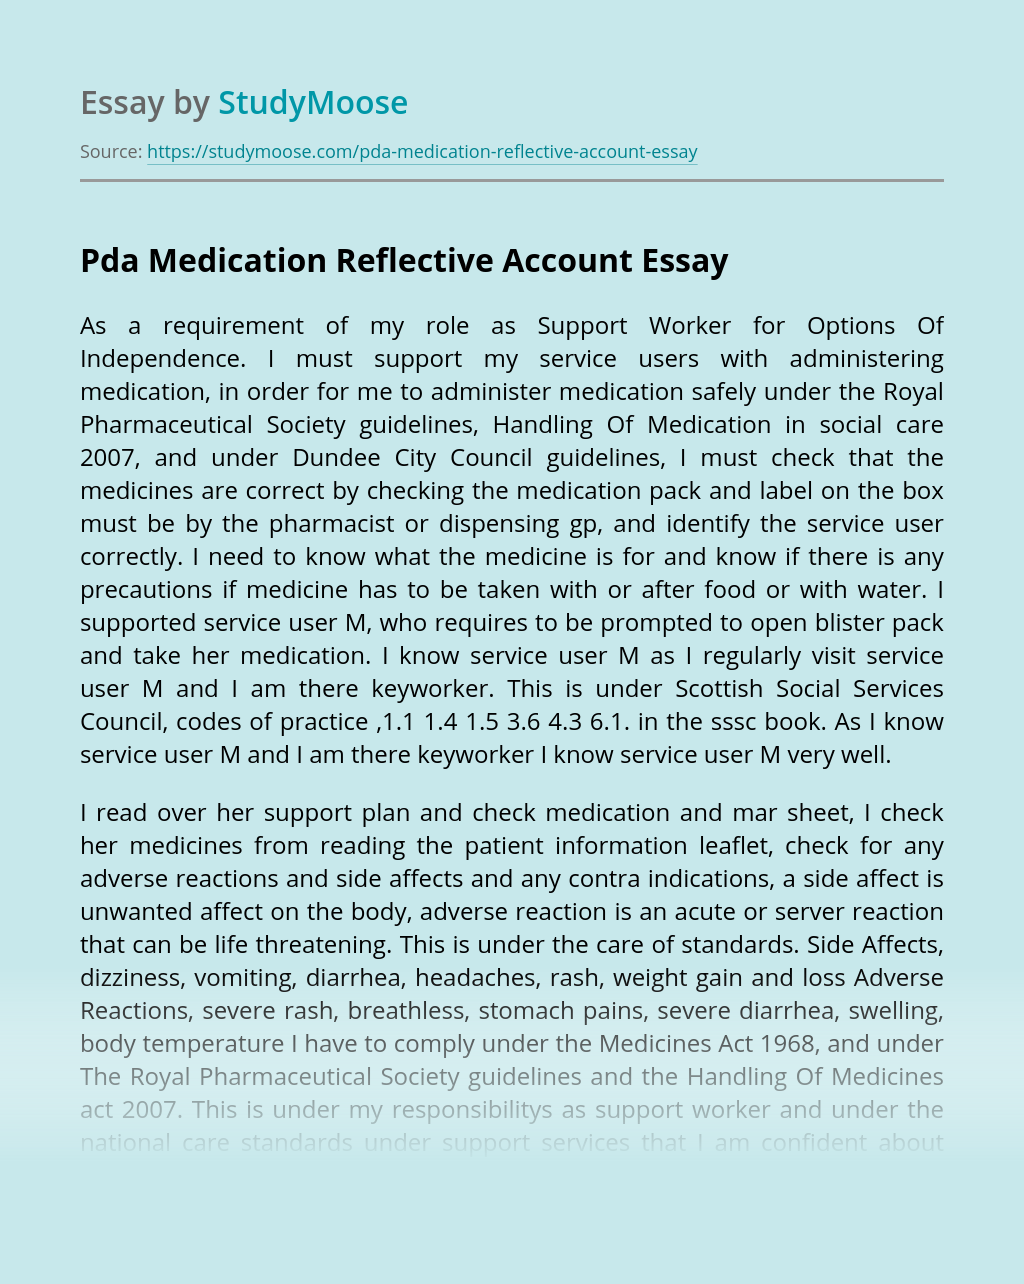 Pda Medication Reflective Account